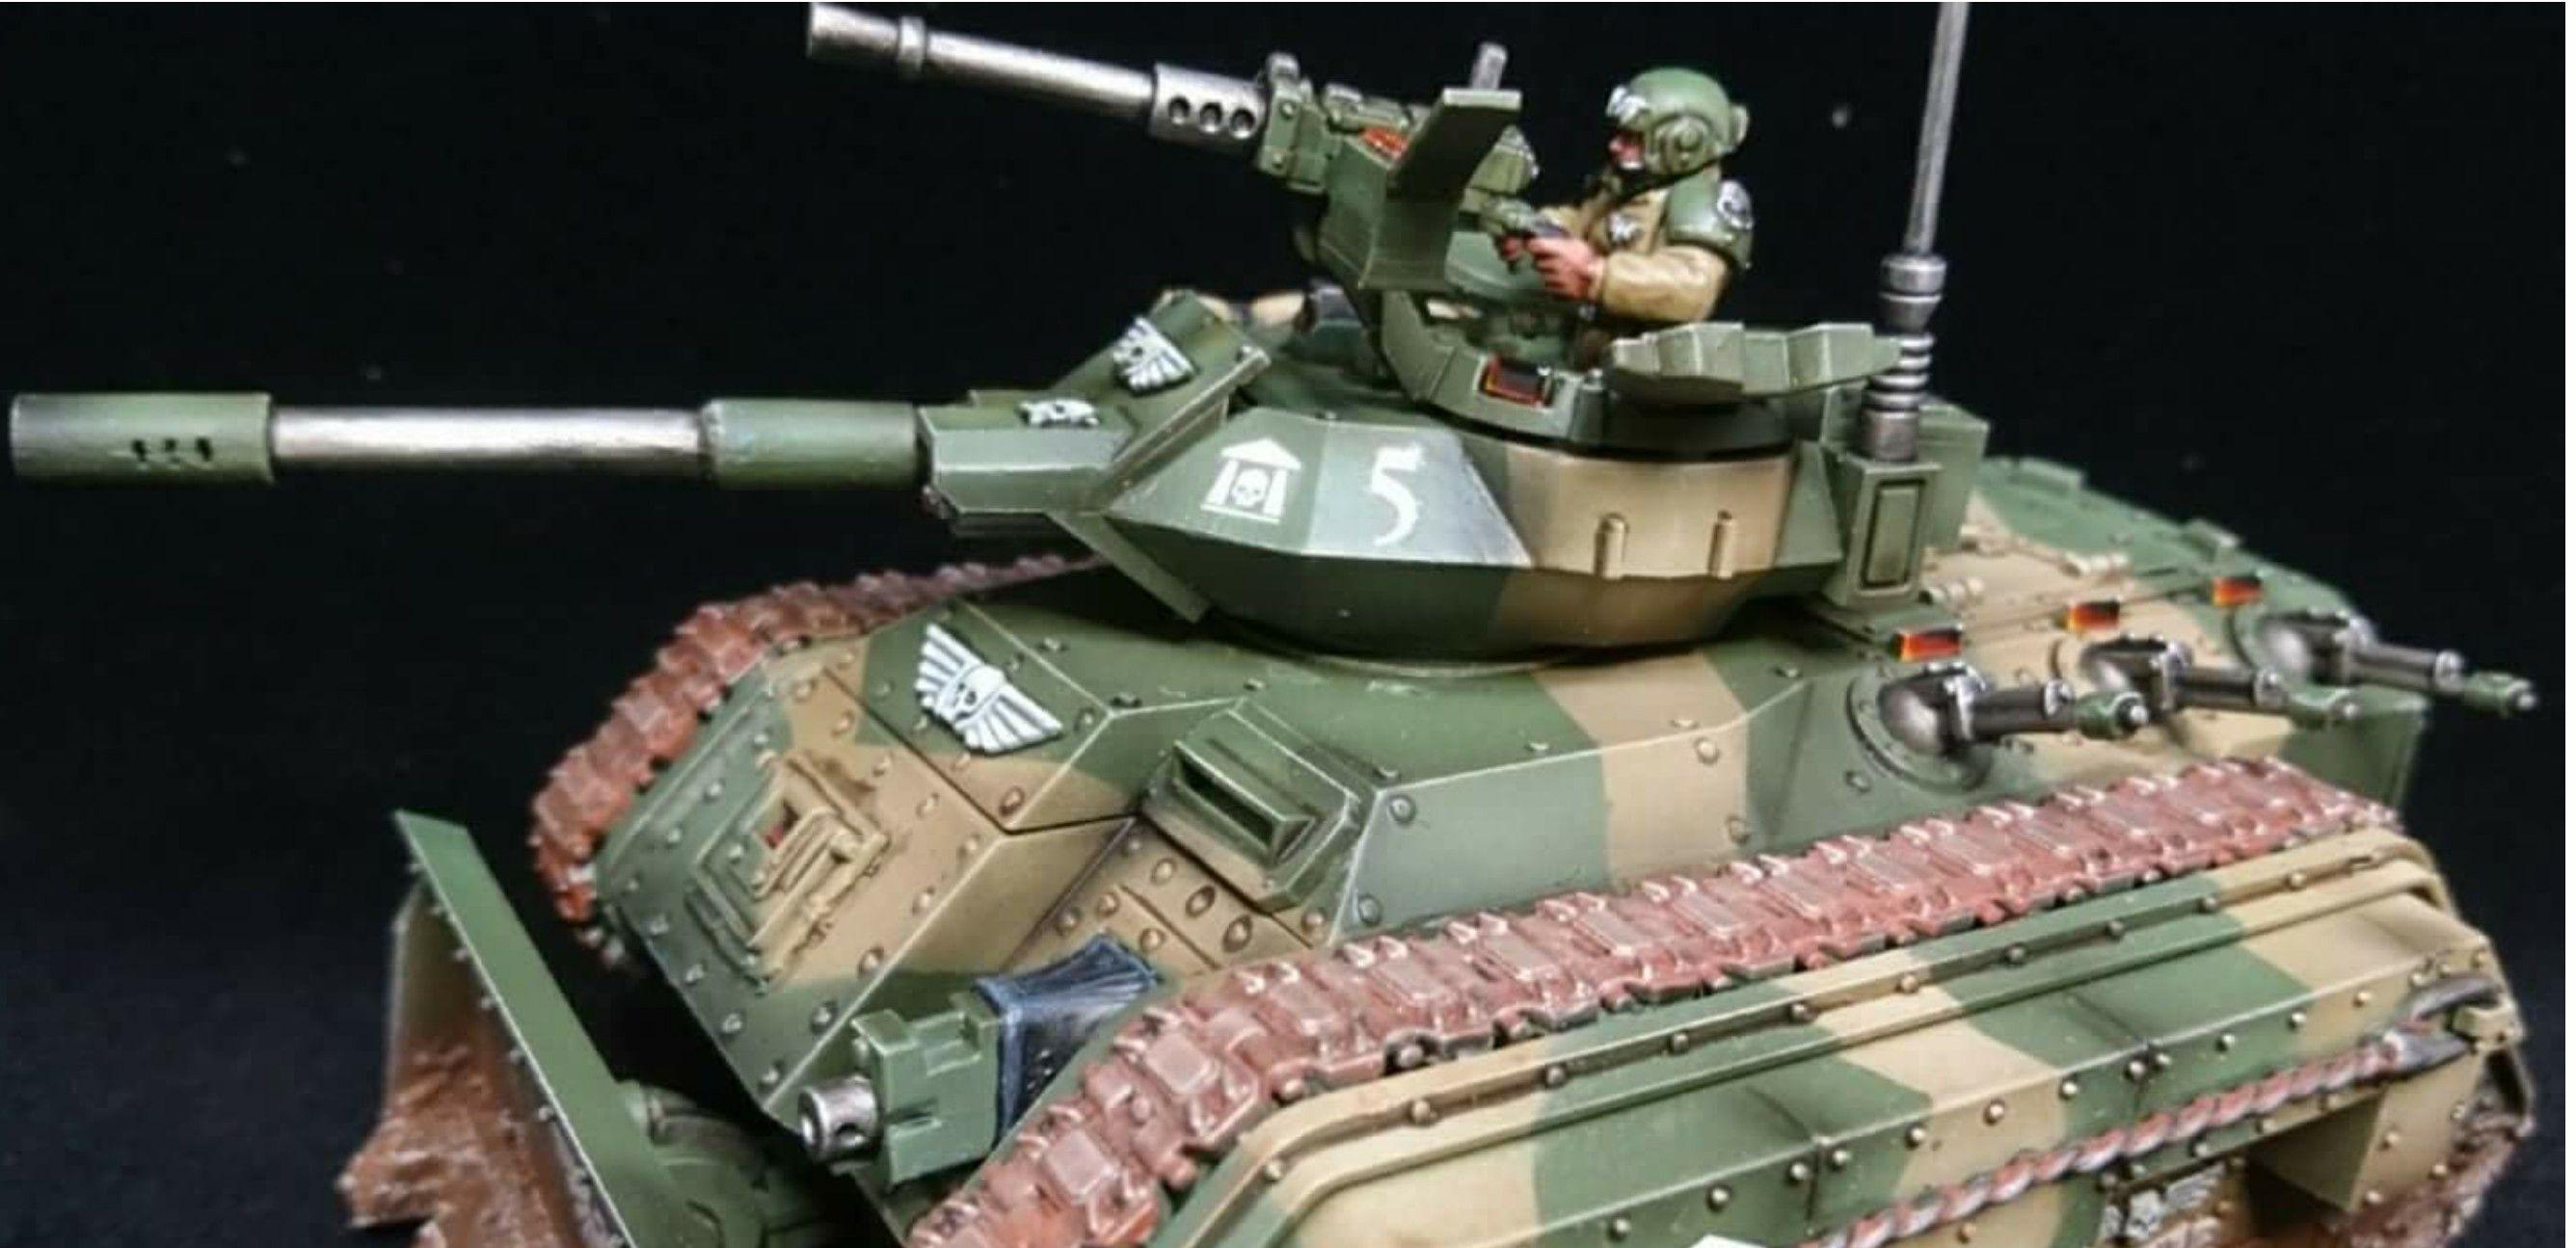 81620da2b297e8f8758d59c874d6d1e2 Great Description About atlas Recovery Tank with Inspiring Images Cars Review